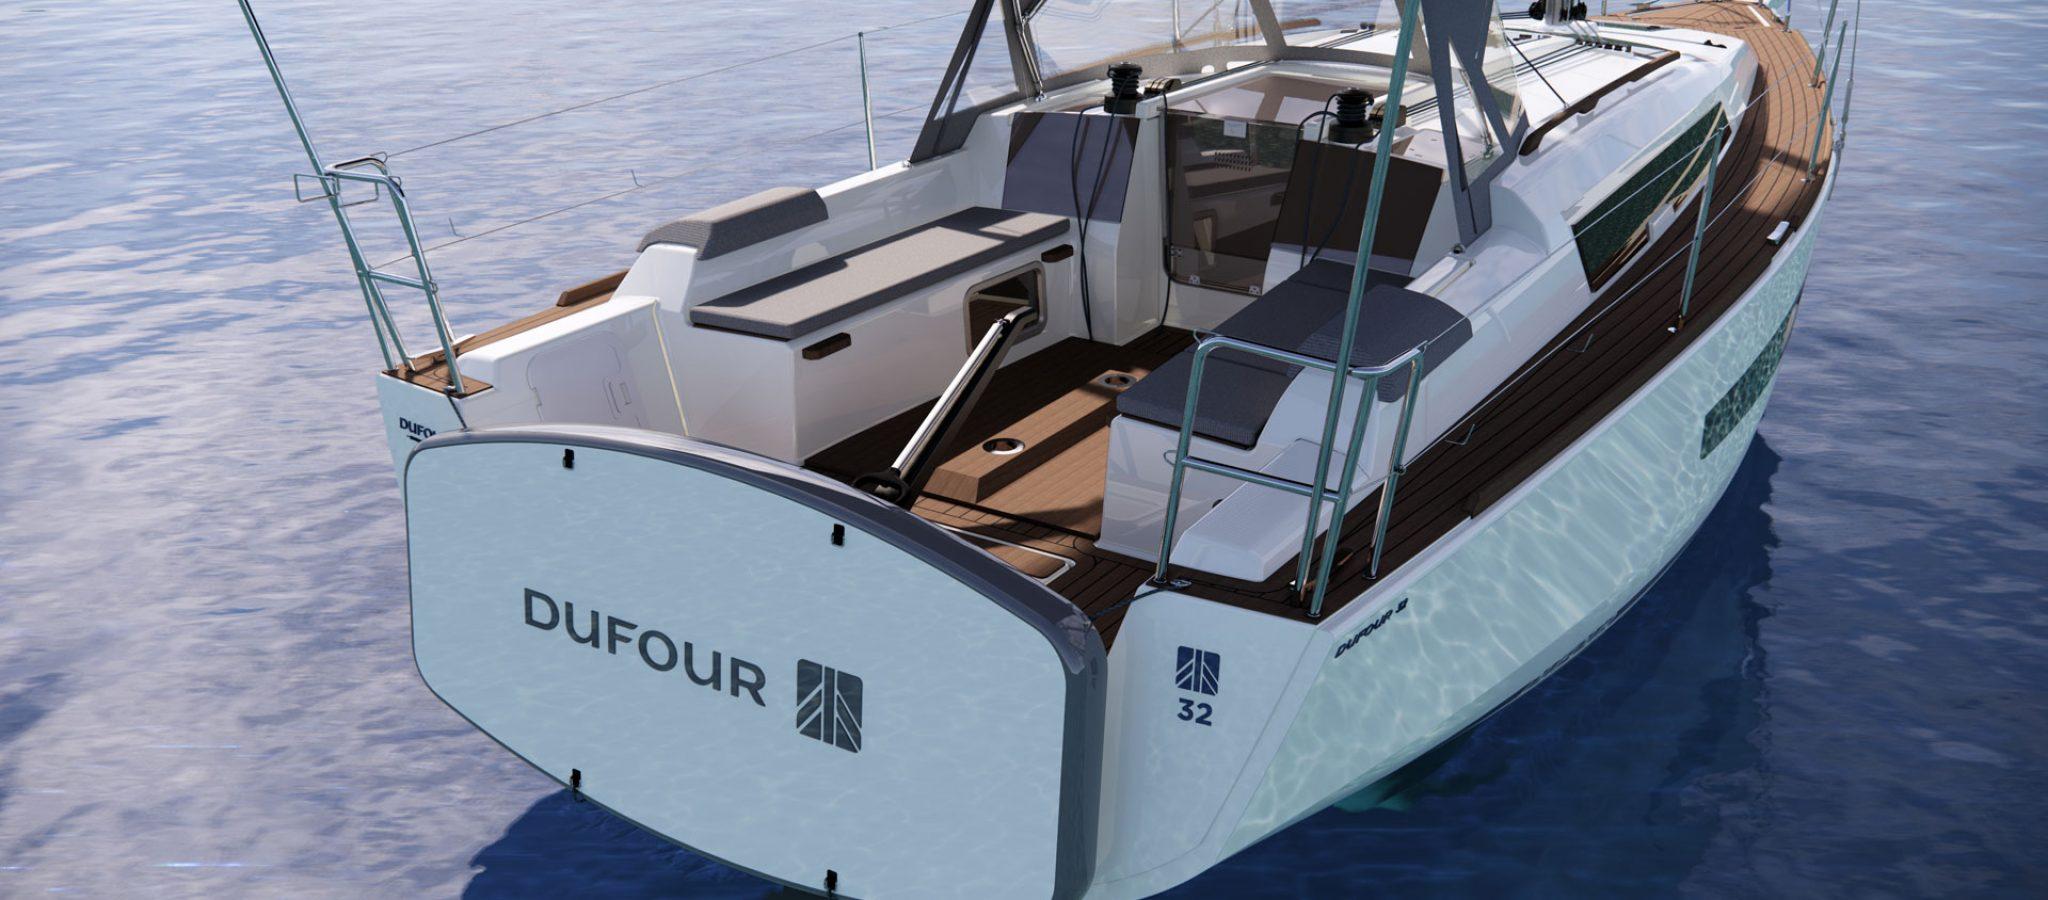 dufour-32-sailing-yacht-luxury-8